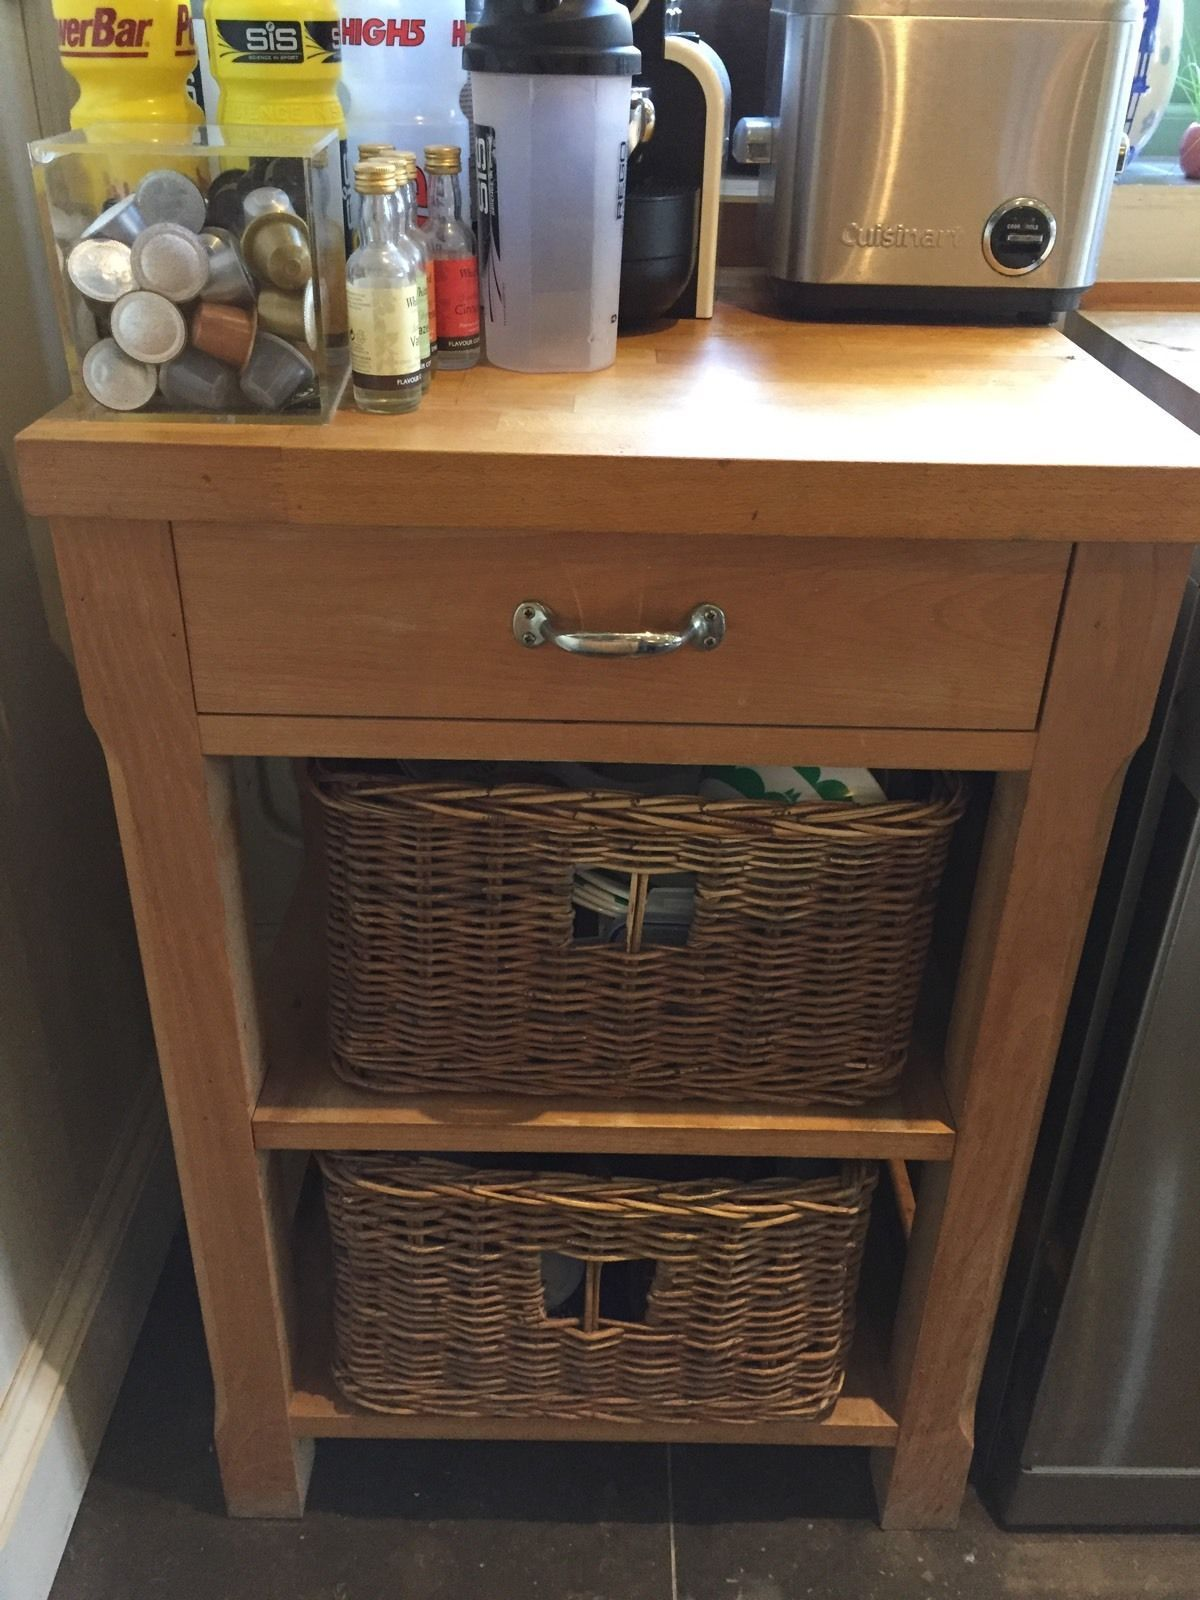 Habitat Olivia Oliva Complete Kitchen USED But Good Condition ...